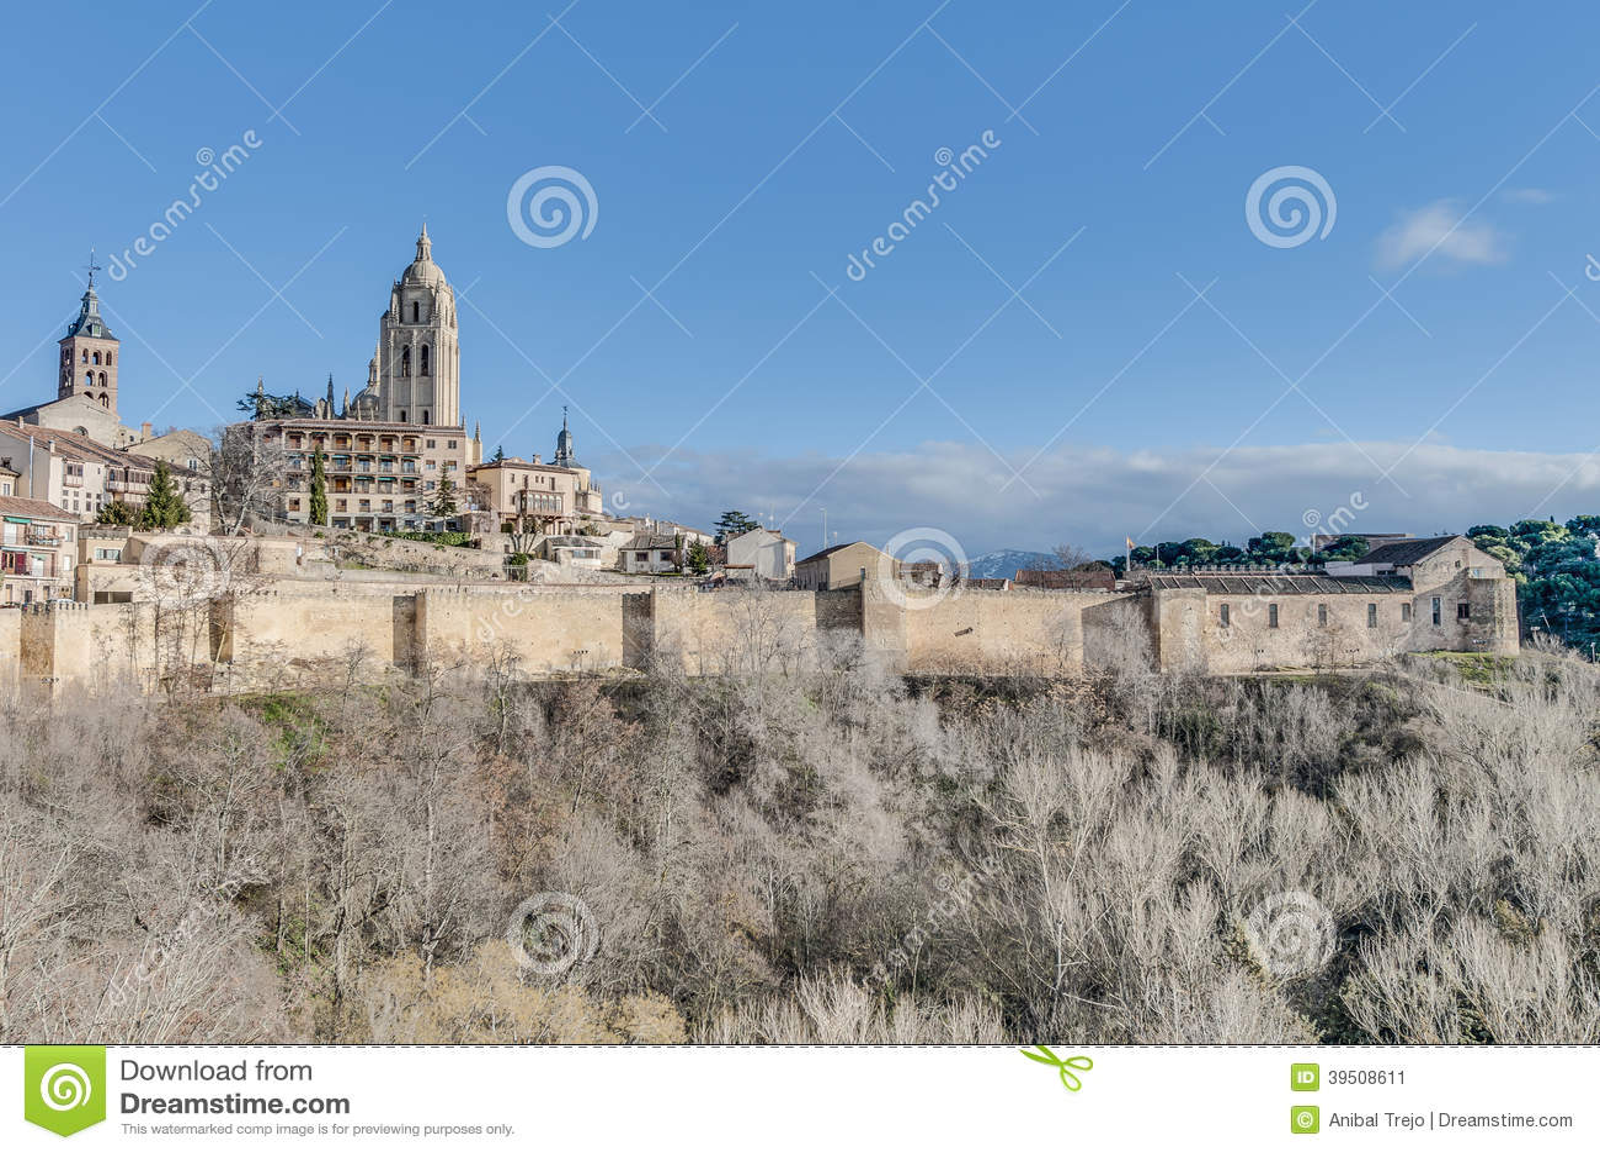 Segovia City walls at Castile and Leon, Spain